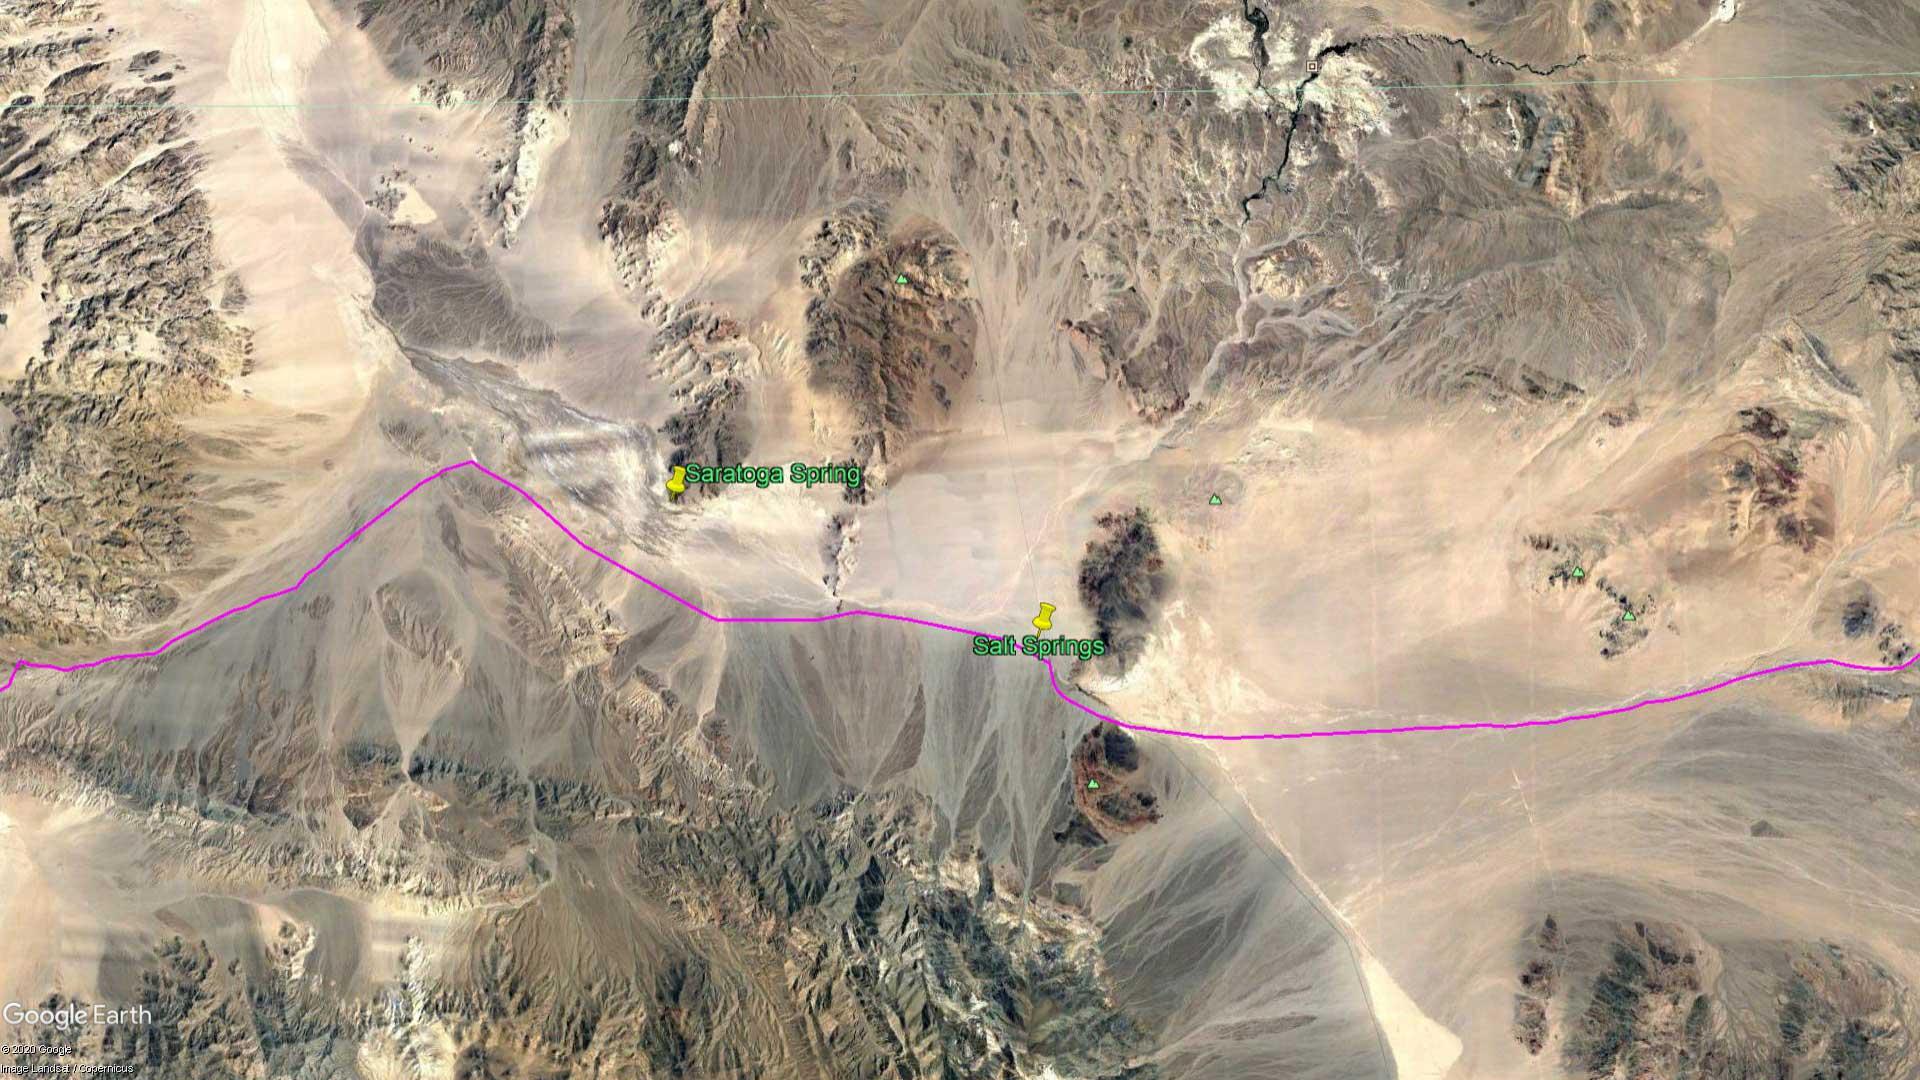 April 7, 1870 - The Mojave Desert